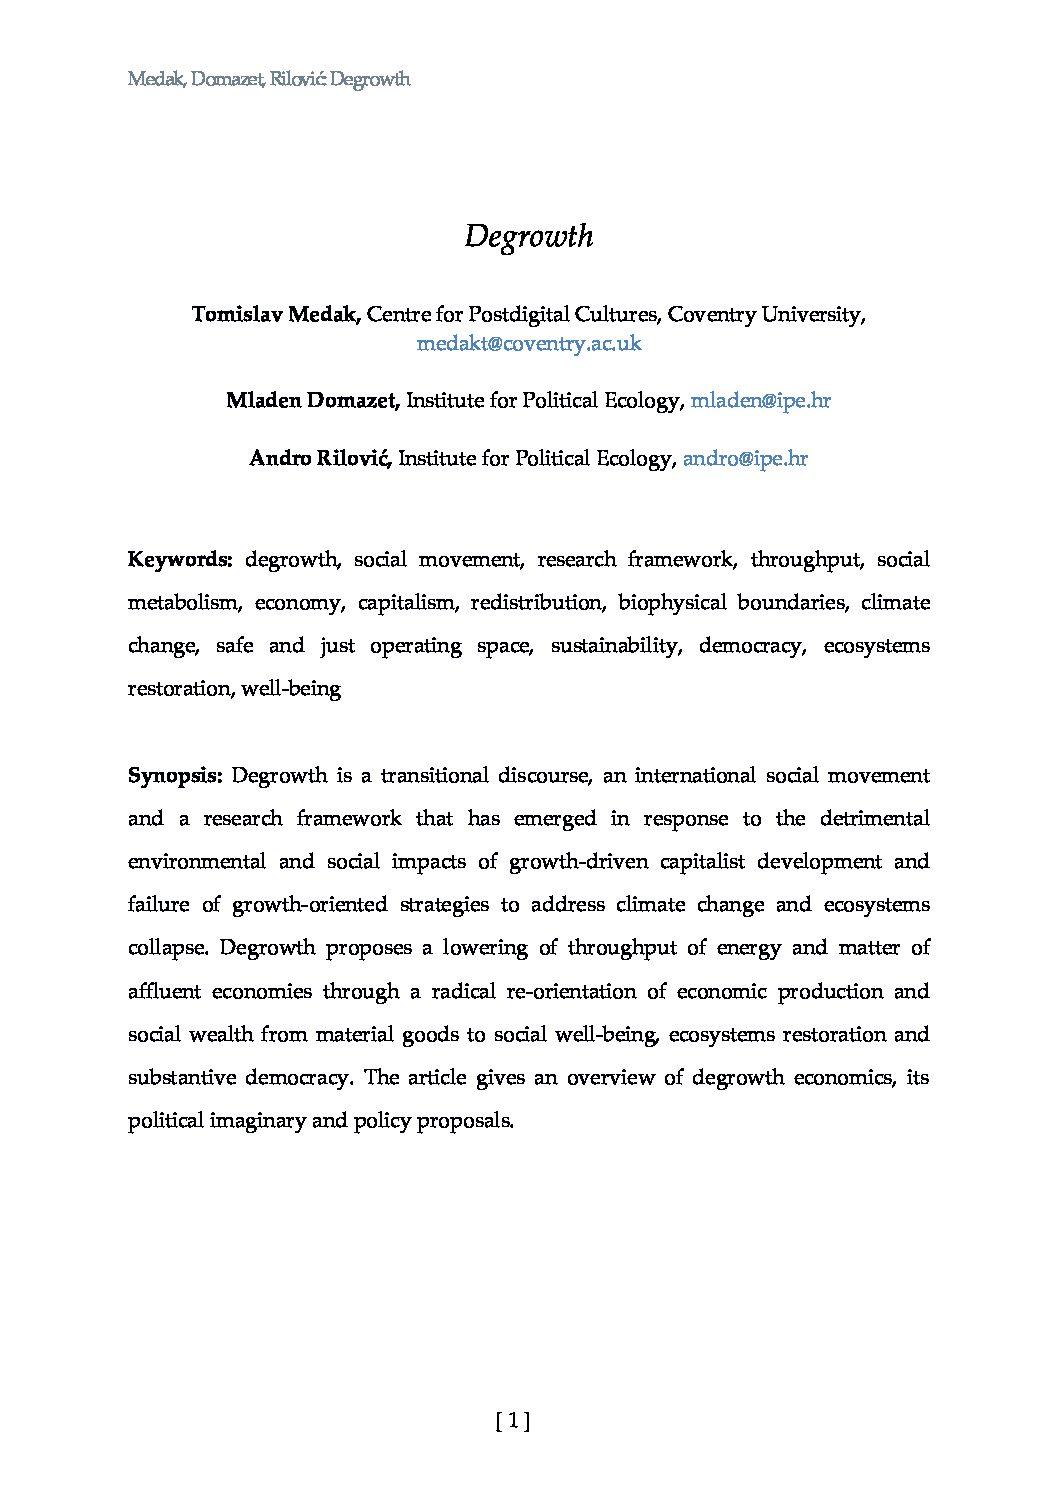 "<a href=""http://ipe.hr/wp-content/uploads/2019/10/Degrowth_Medak-et-al.pdf"">Medak, Domazet, Rilović (2019) ""Degrowth"" - DRAFT, do not cite or distribute</a>"